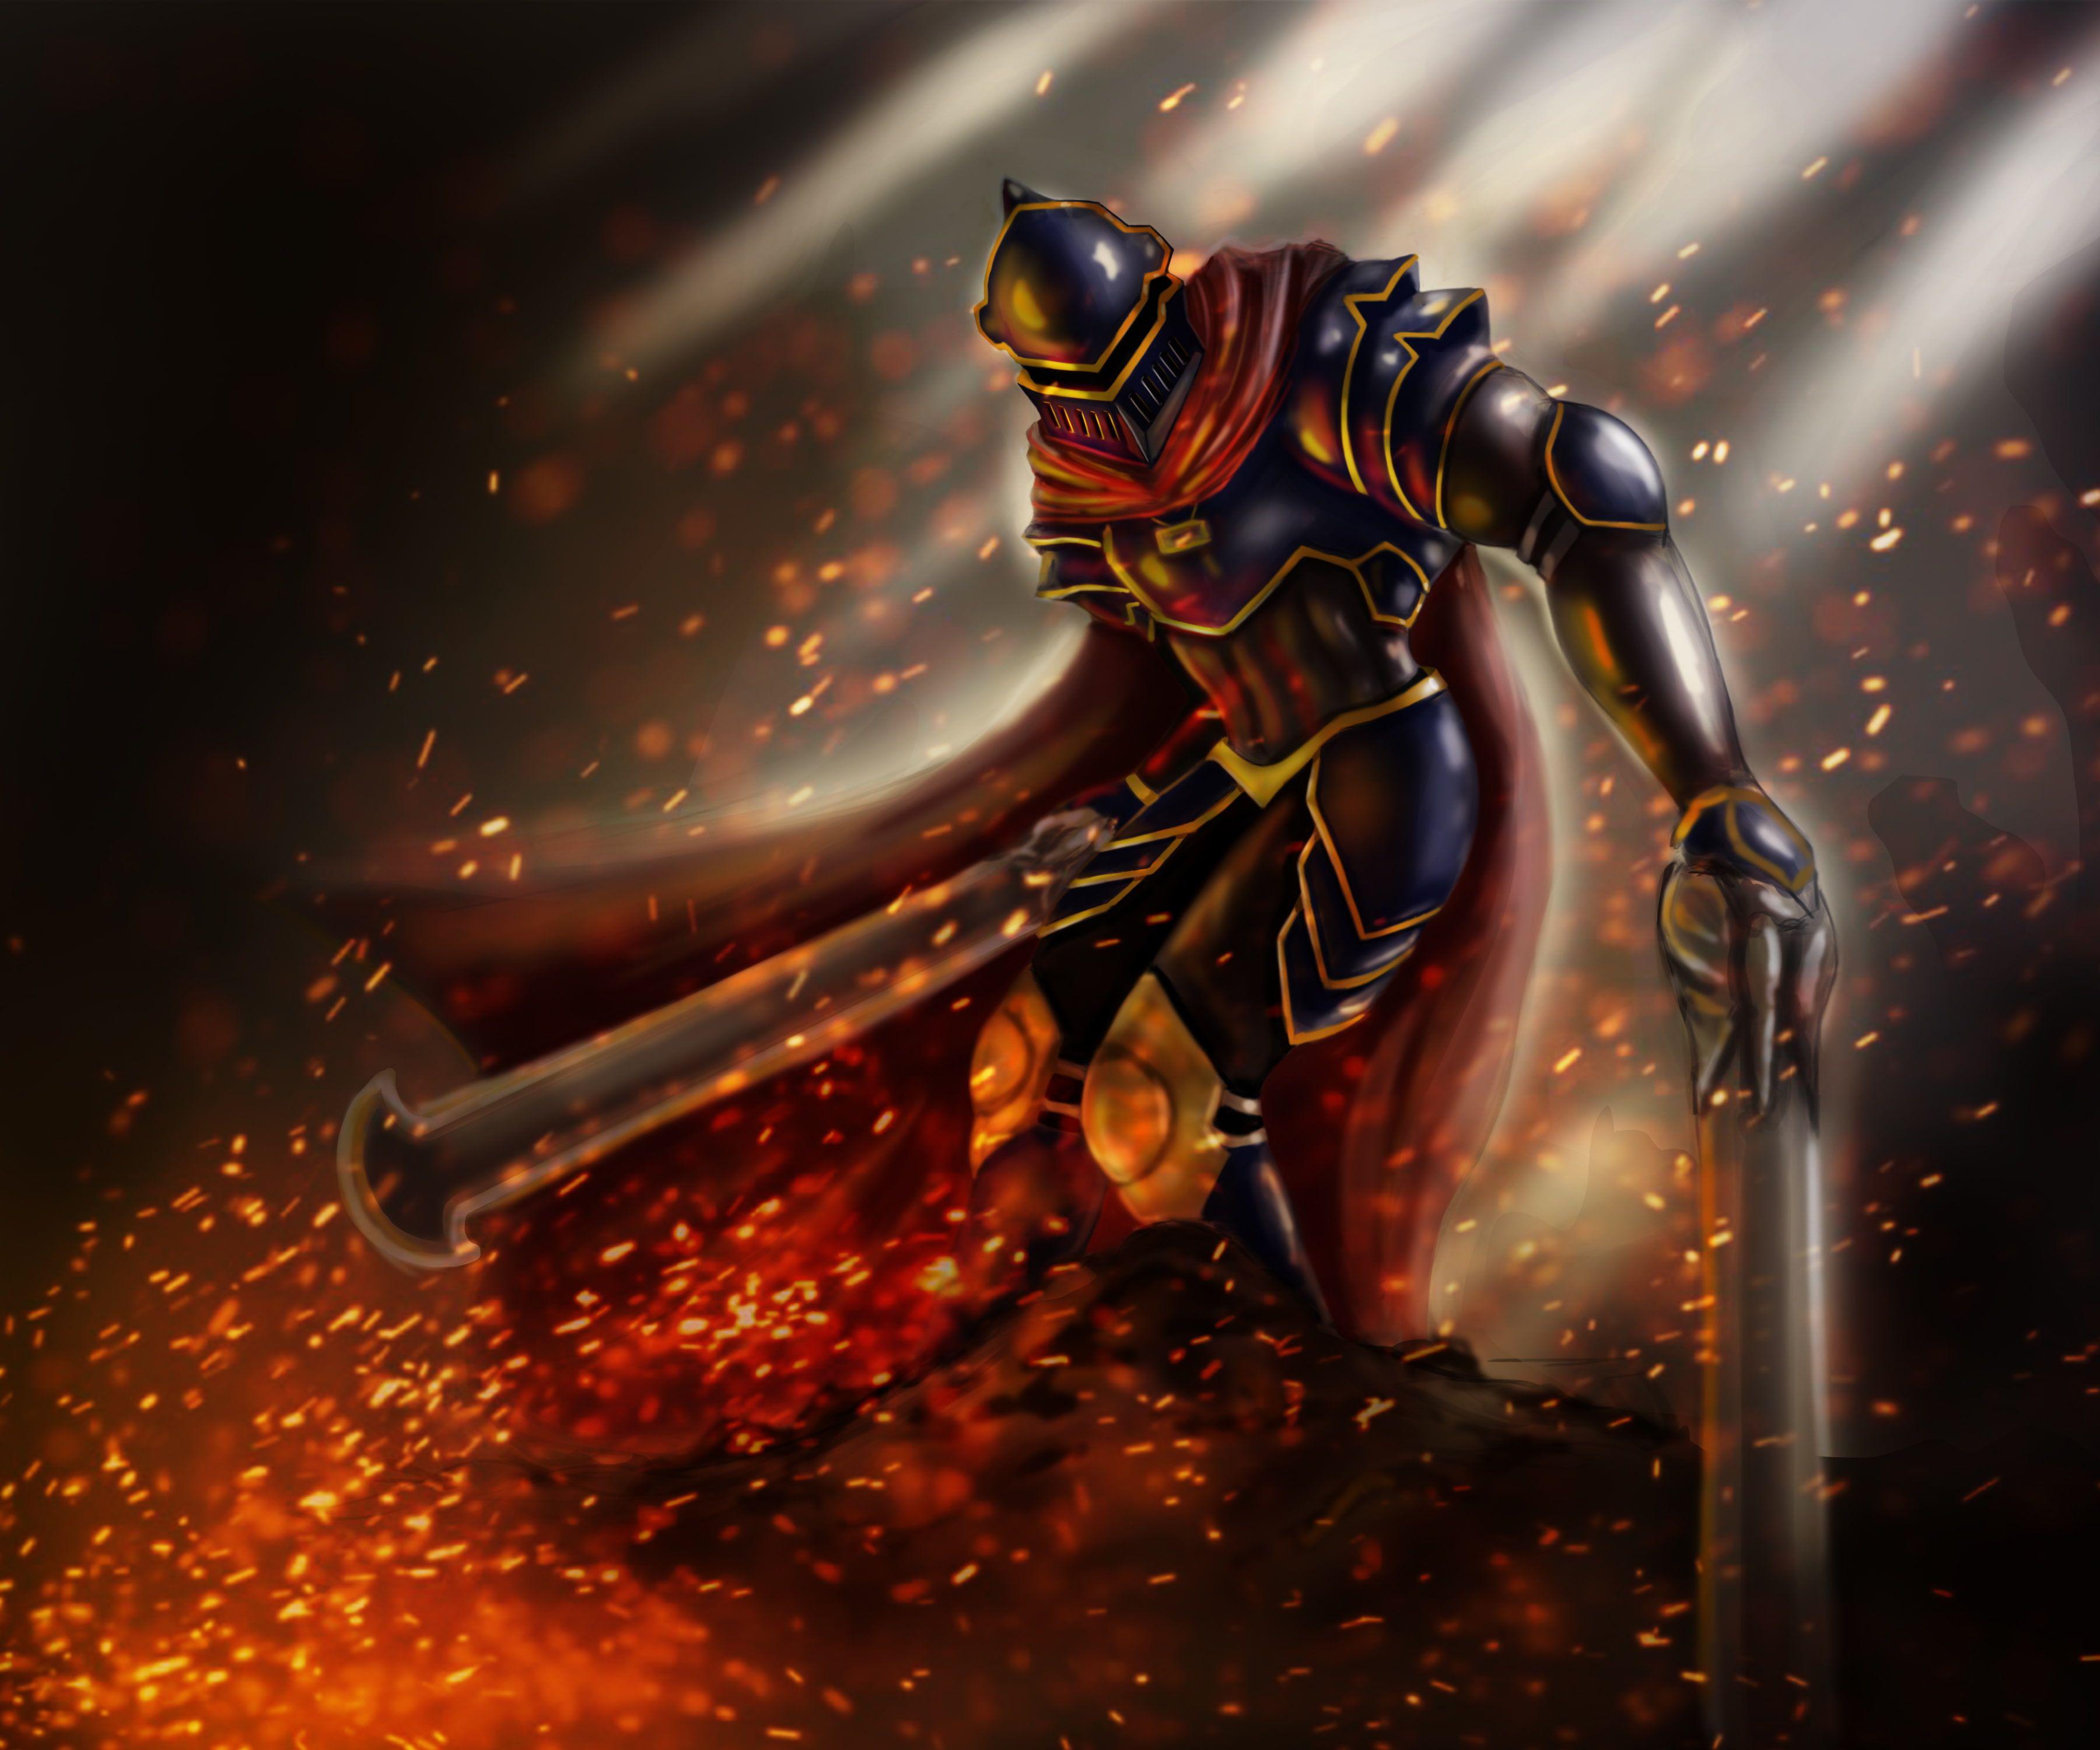 Overlord Anime Shalltear Bloodfallen Knight Fighting 3840x2160 Wallpaper Shalltear Bloodfallen Overlord Anime Overlord Anime Wallpapers